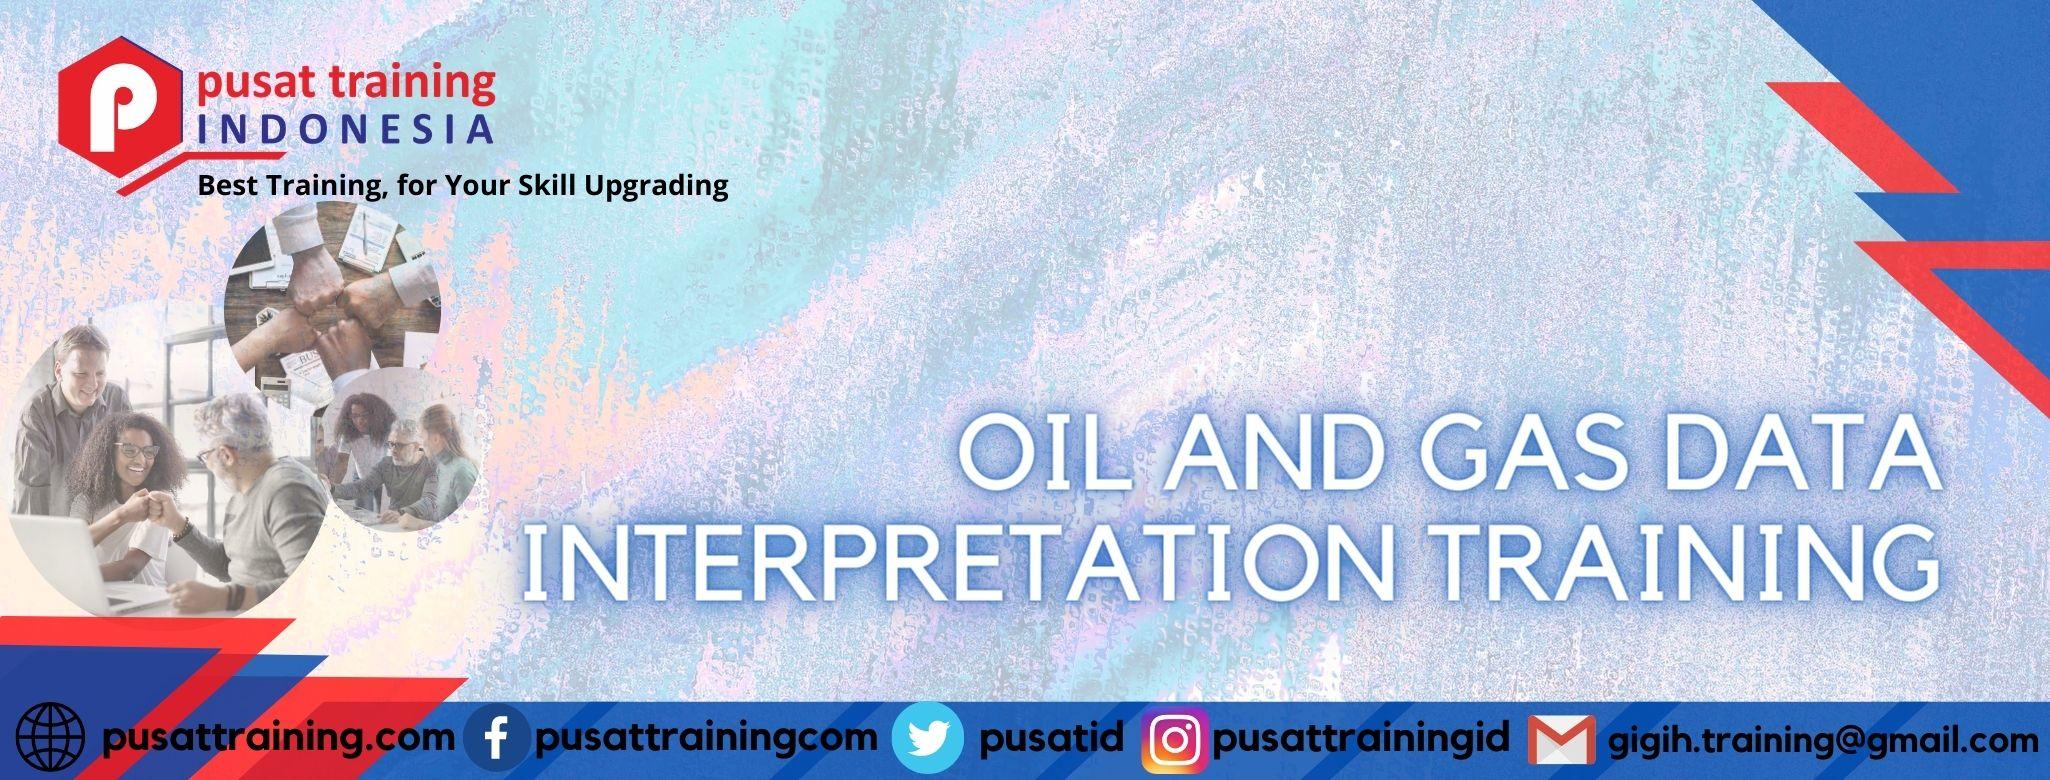 oil-and-gas-data-interpretation-training